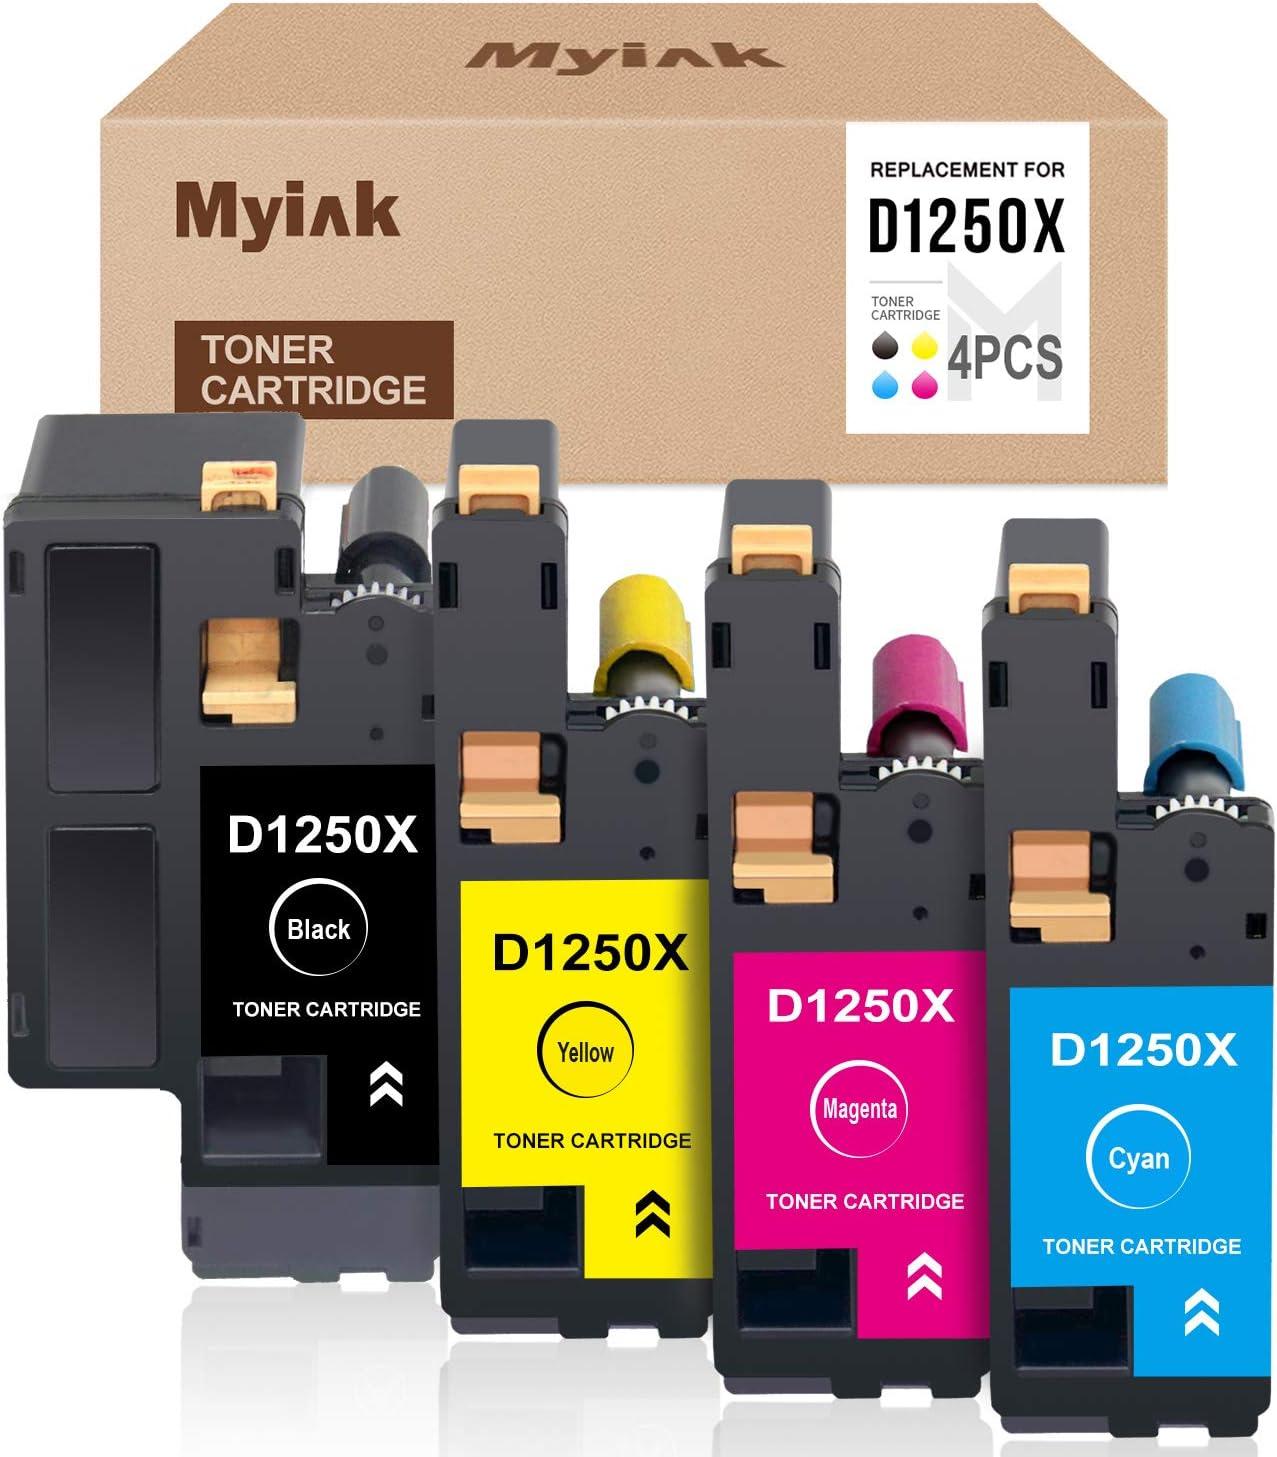 MYIK Compatible Toner Cartridge Replacement for Dell 1250 810WH C5GC3 XMX5D WM2JC to use with C1760nw 1250c C1765nfw 1350cnw 1355cn 1355cnw (Black, Cyan, Magenta, Yellow, 4-Pack)